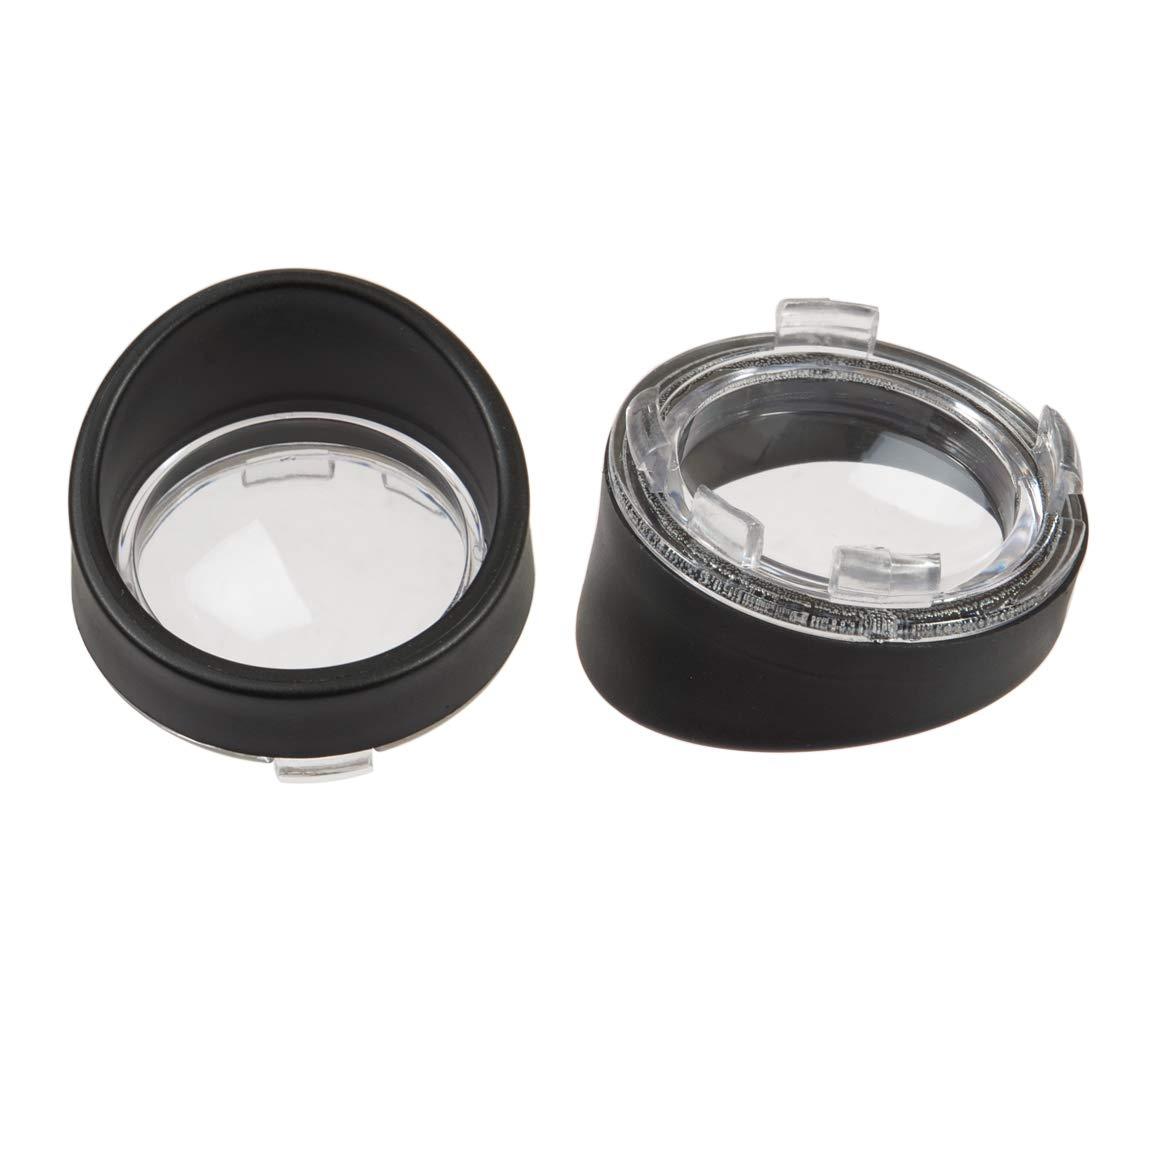 Compatible for Harley Dyna Street Glide Road Softail Custom Cruiser 1986-2020 Bullet Turn Signal Light Bezels,Black Visor Style PBYMT Clear Lens Cover